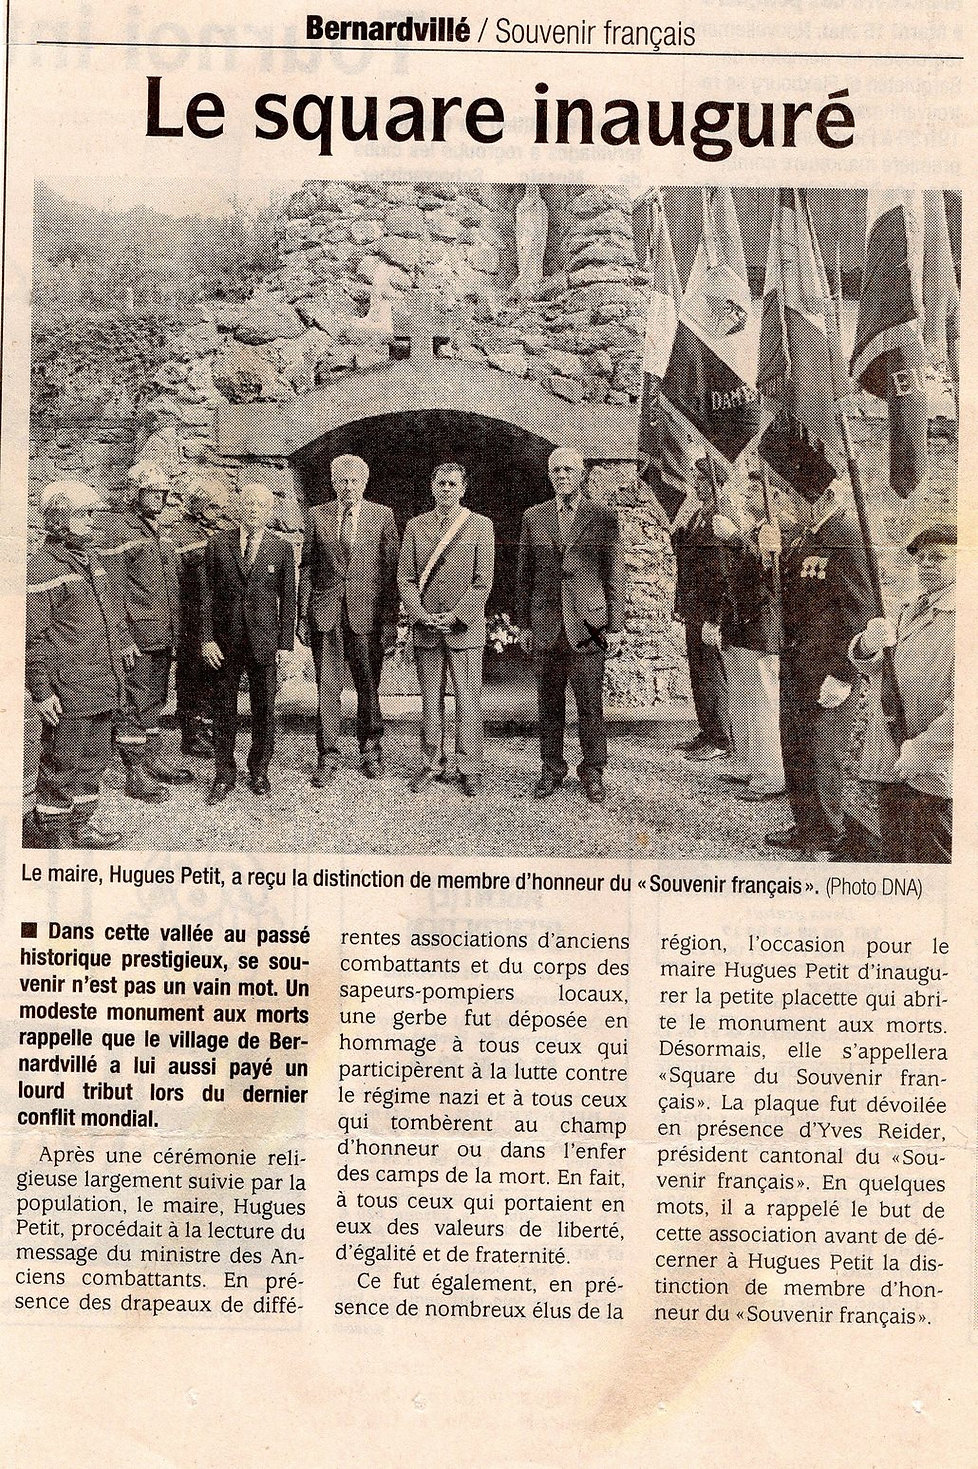 Inauguration du square211 (Copier).jpg